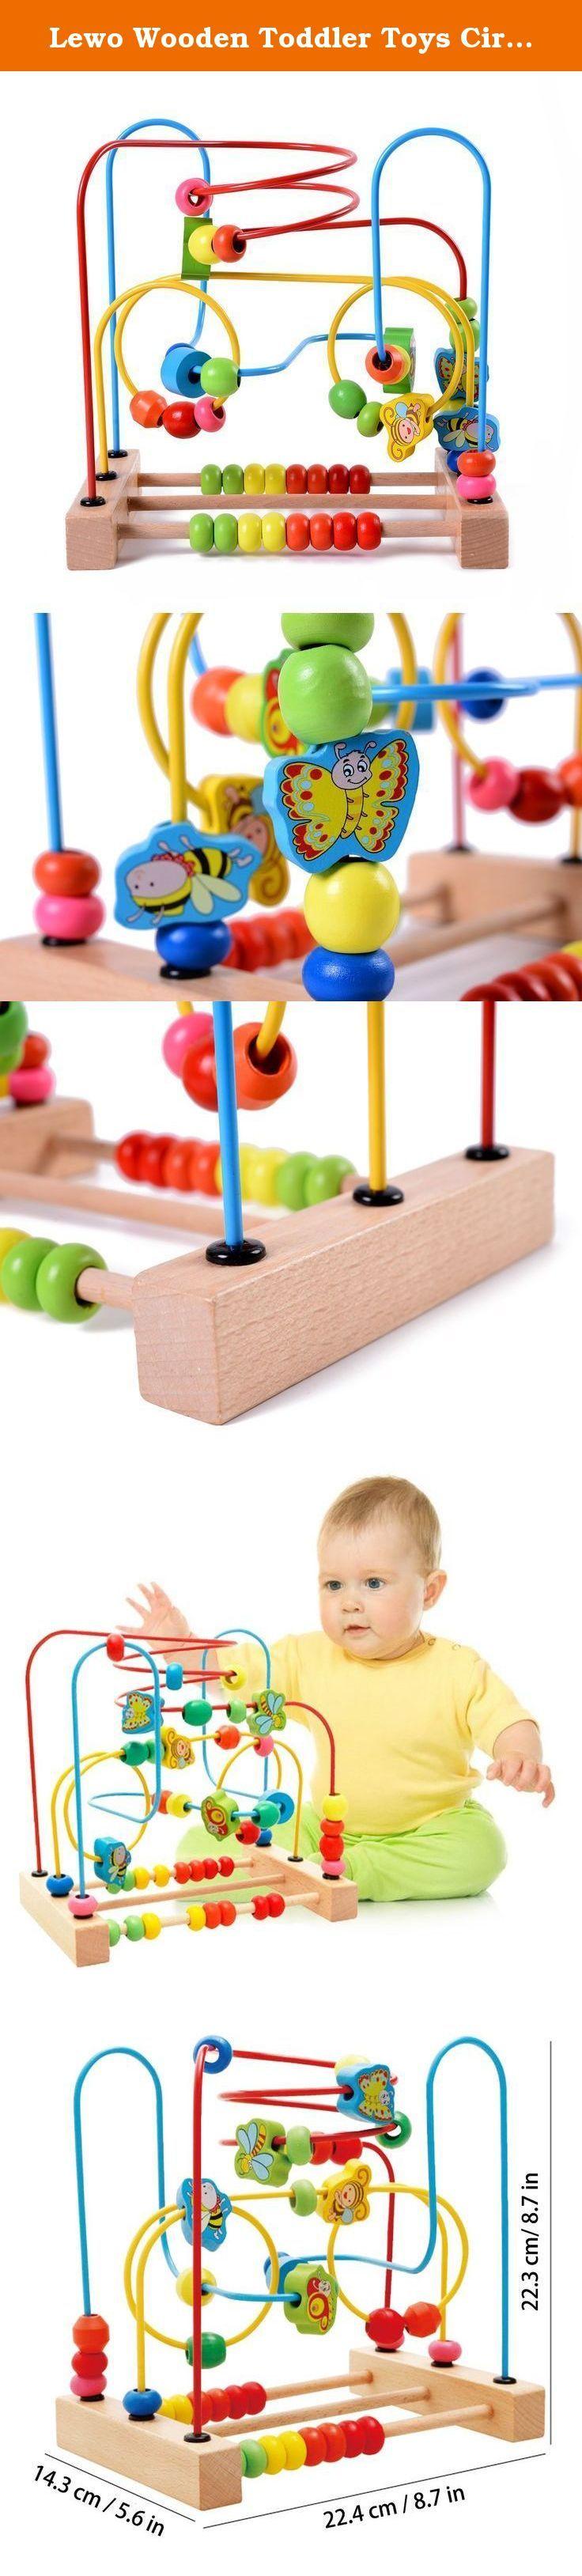 Boy Toys Description : Ideas about best toddler toys on pinterest